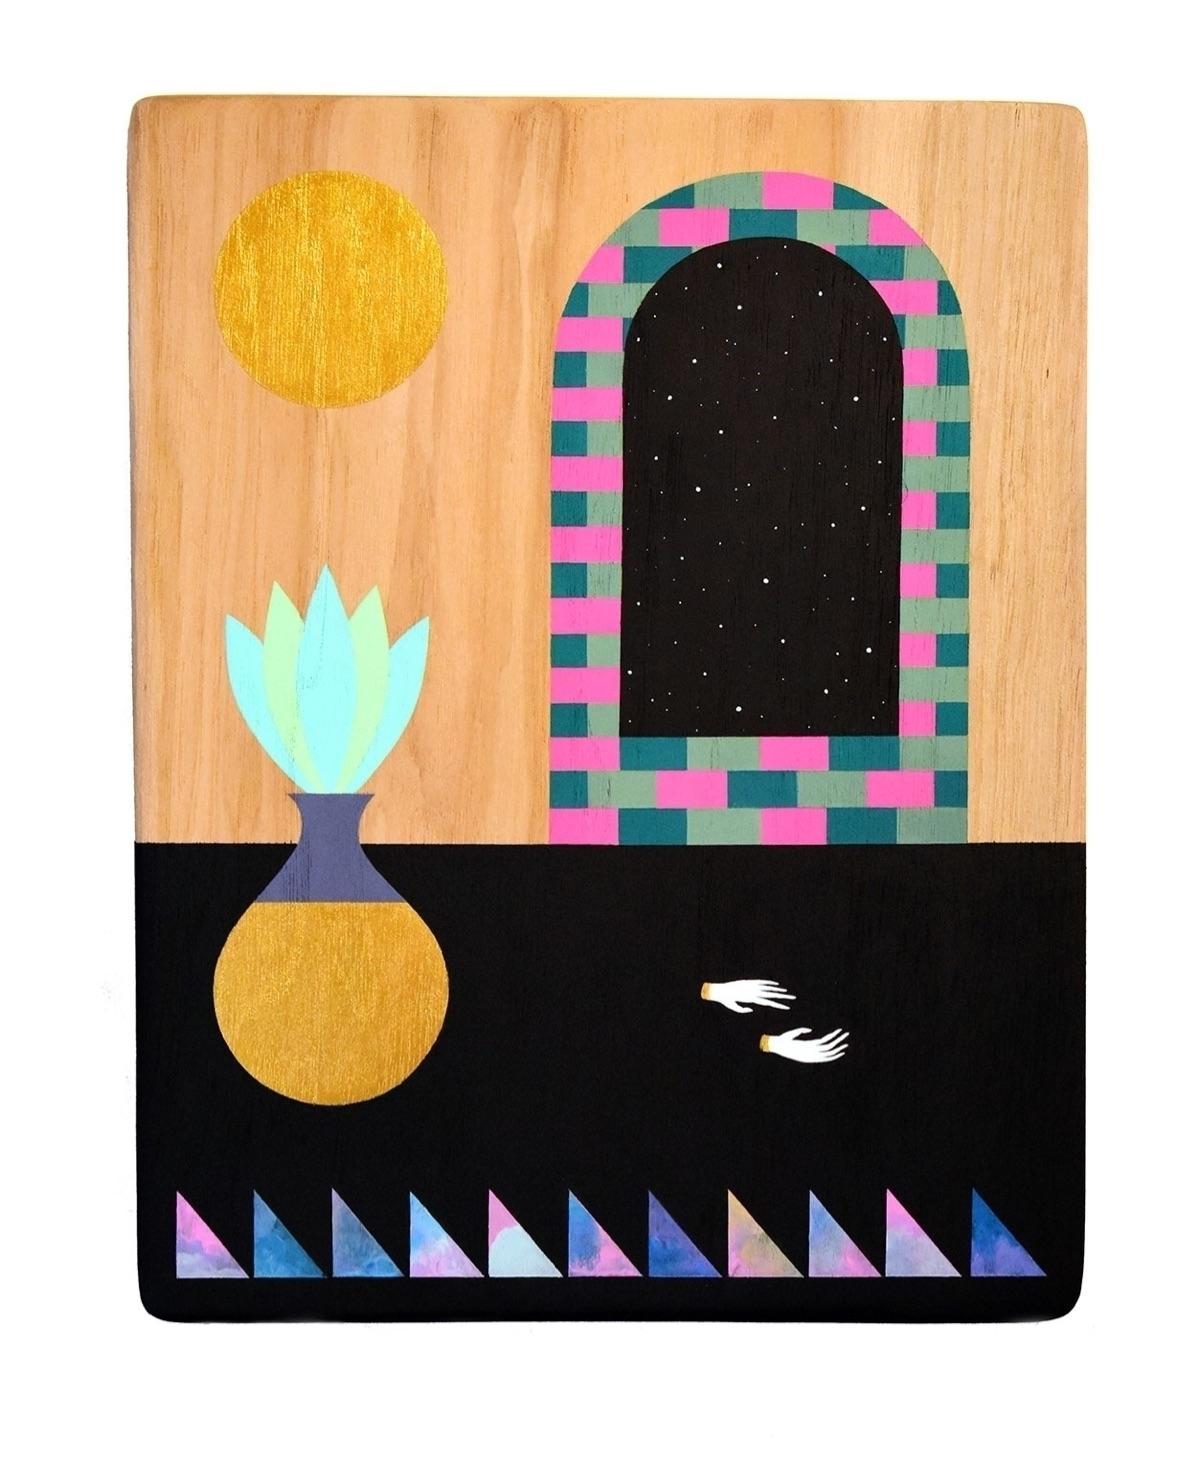 acrylic pecan wood 14 11 inches - adrianlandonbrooks | ello